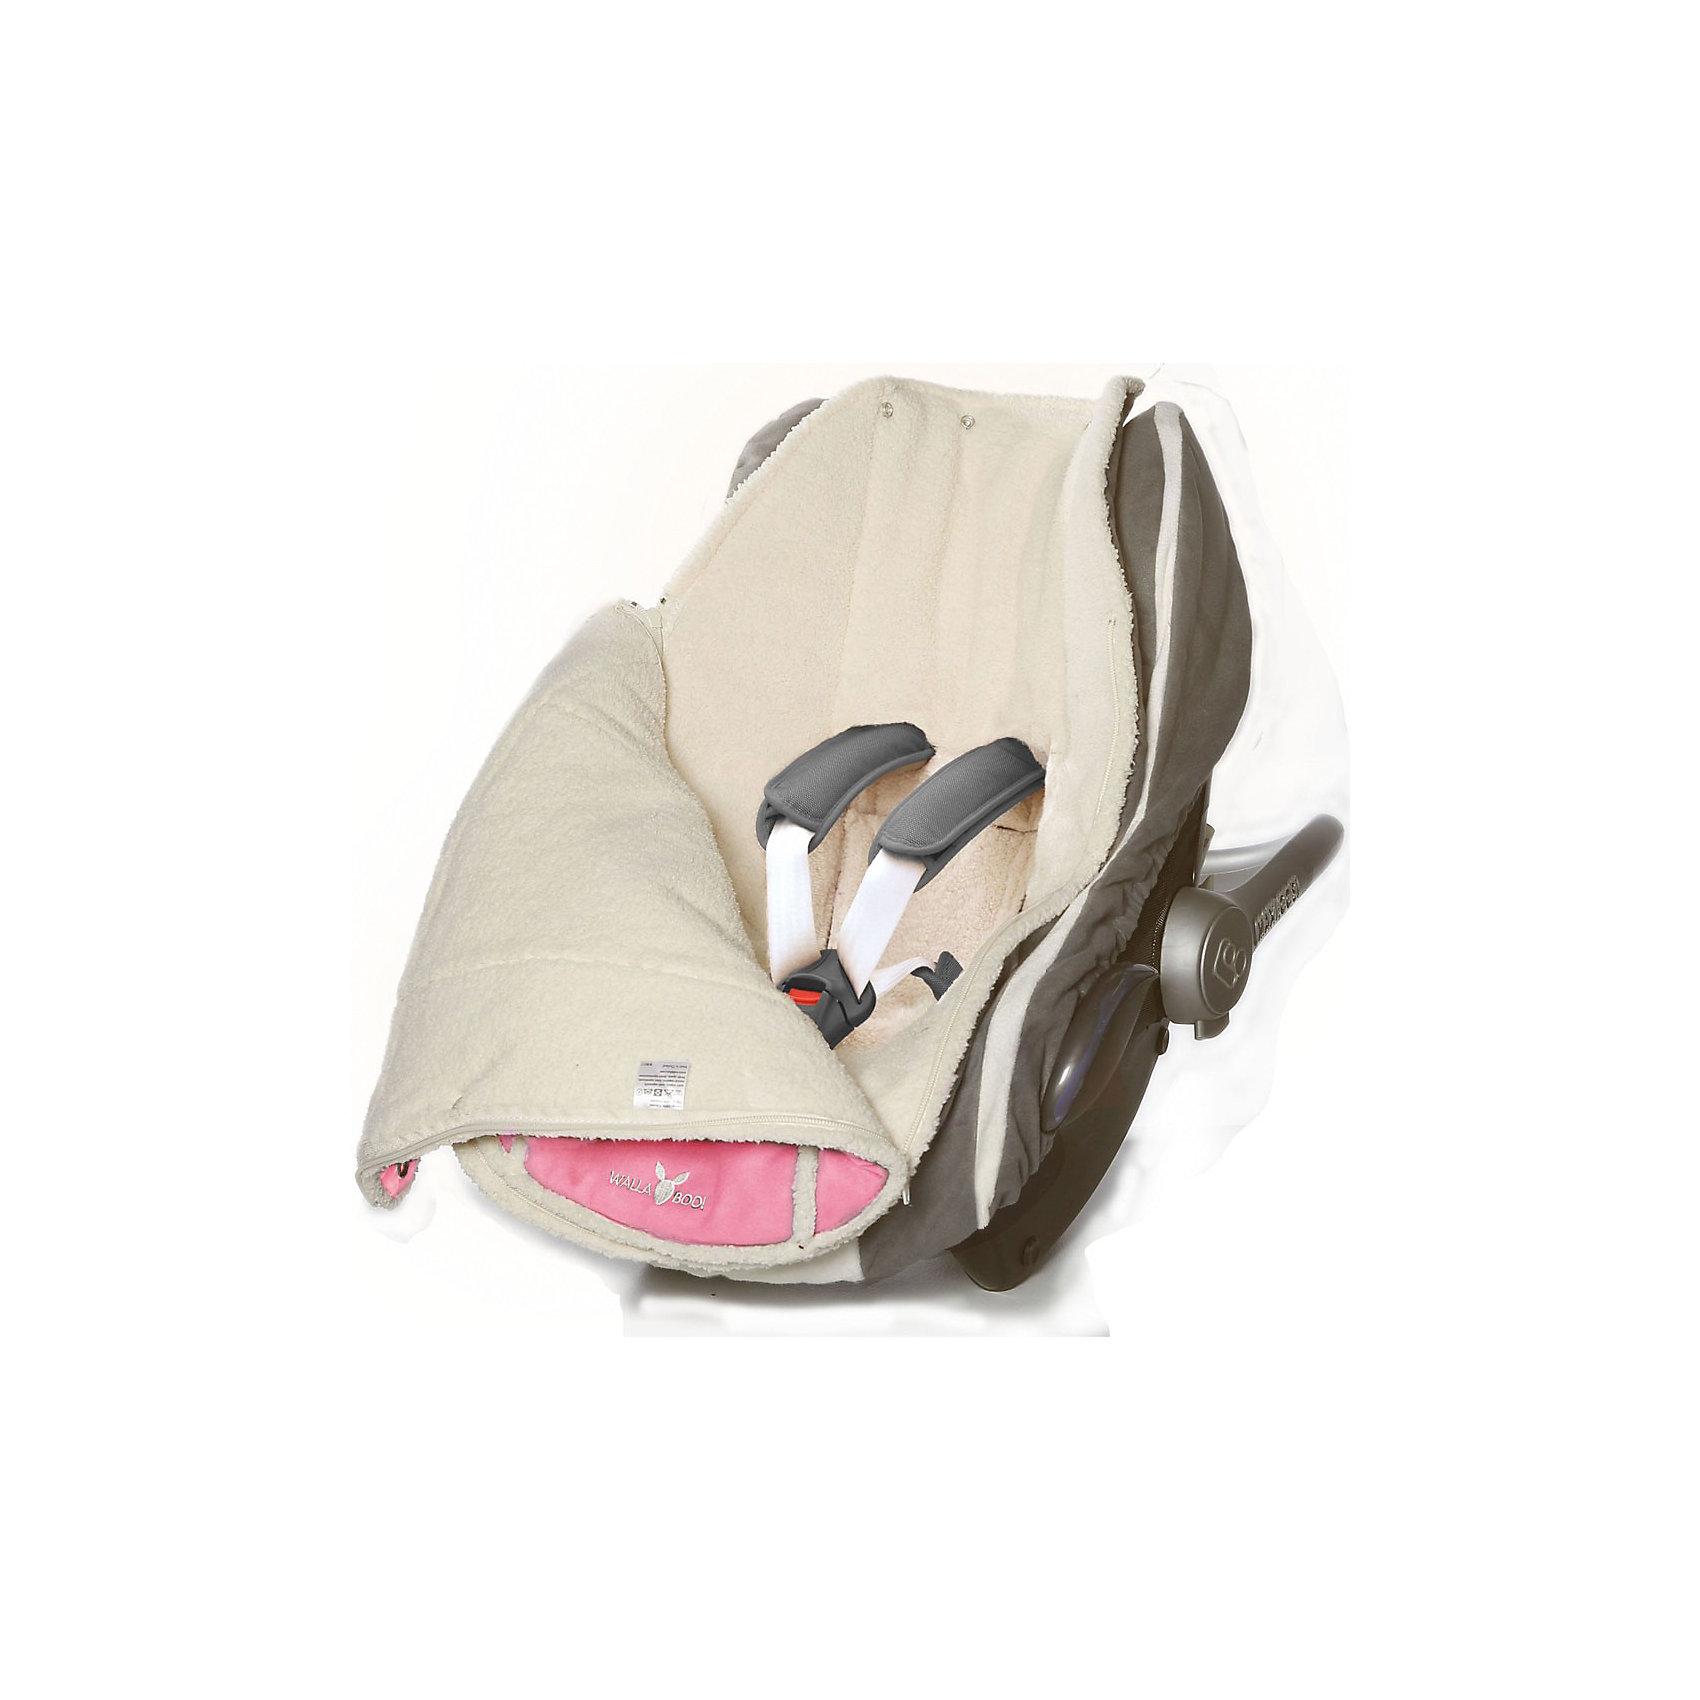 Конверт в коляску 0-12 месяцев, Wallaboo, розовый от myToys